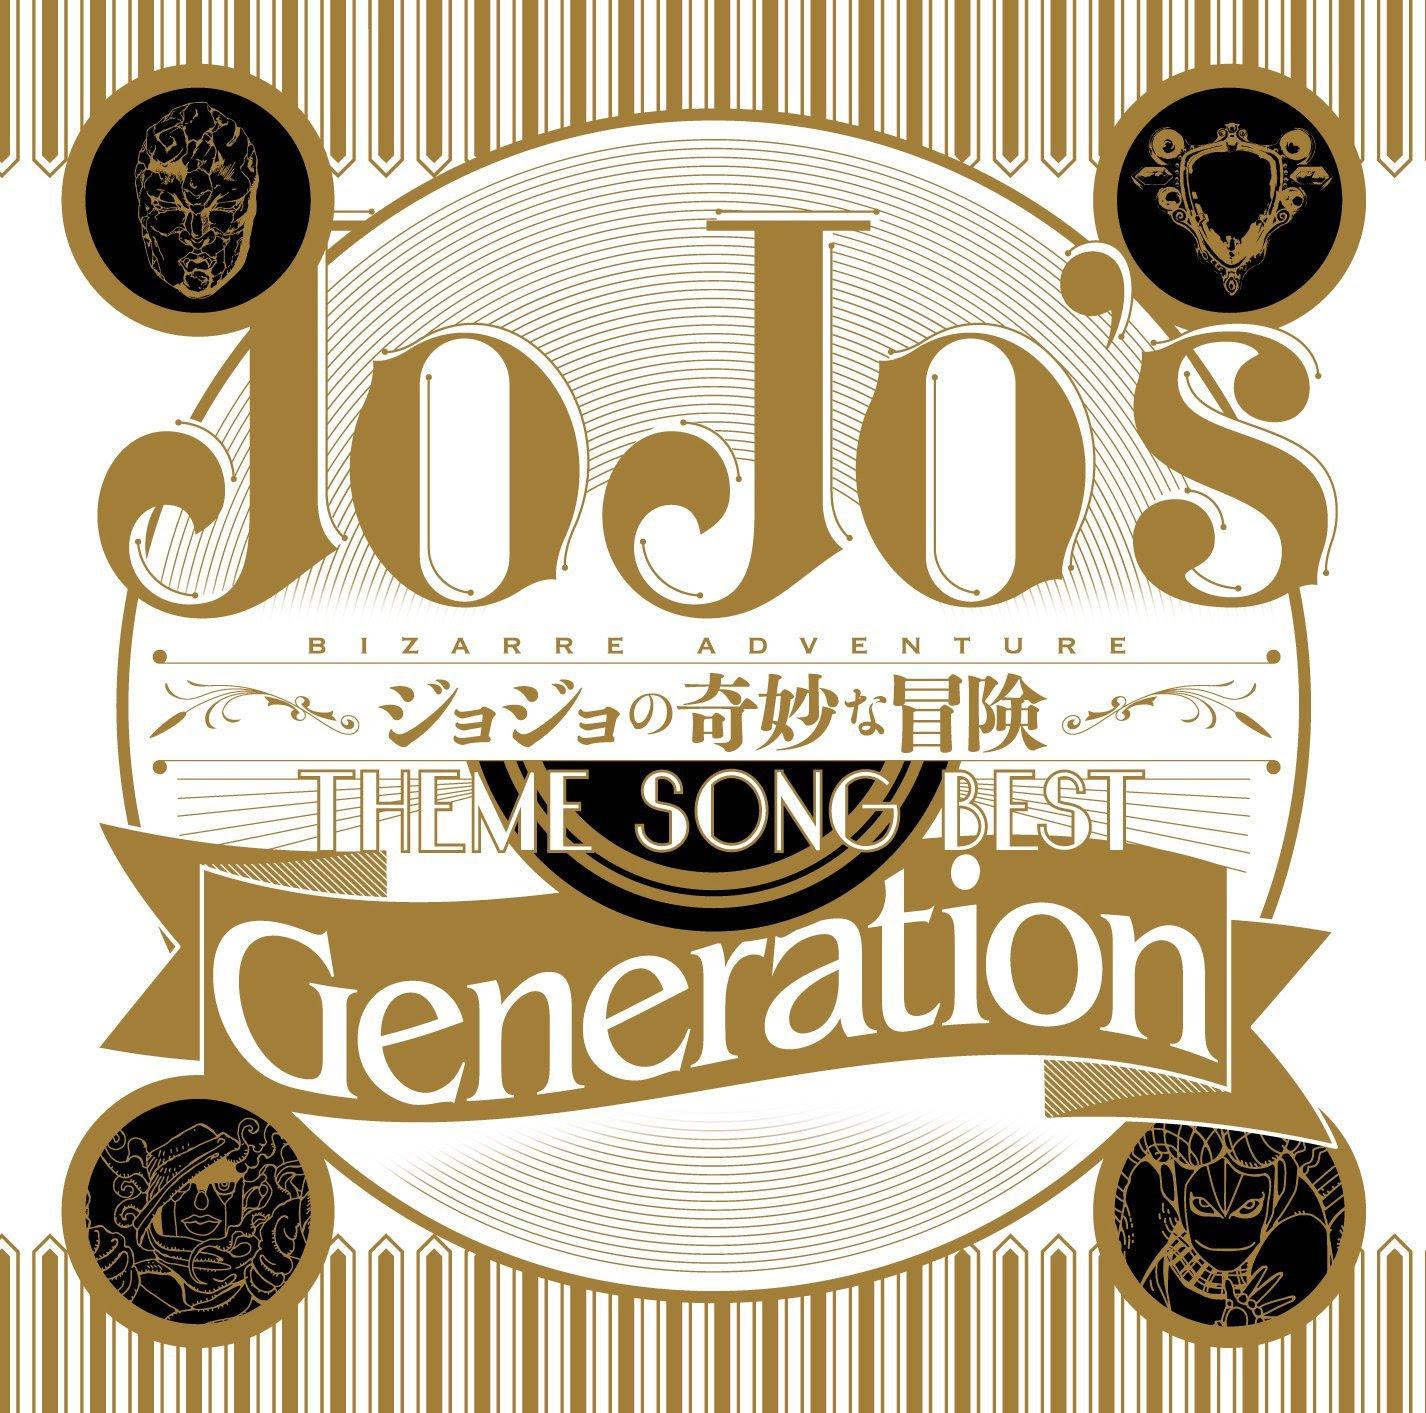 JoJo's Bizarre Adventure - Theme Song Best : Generation OST